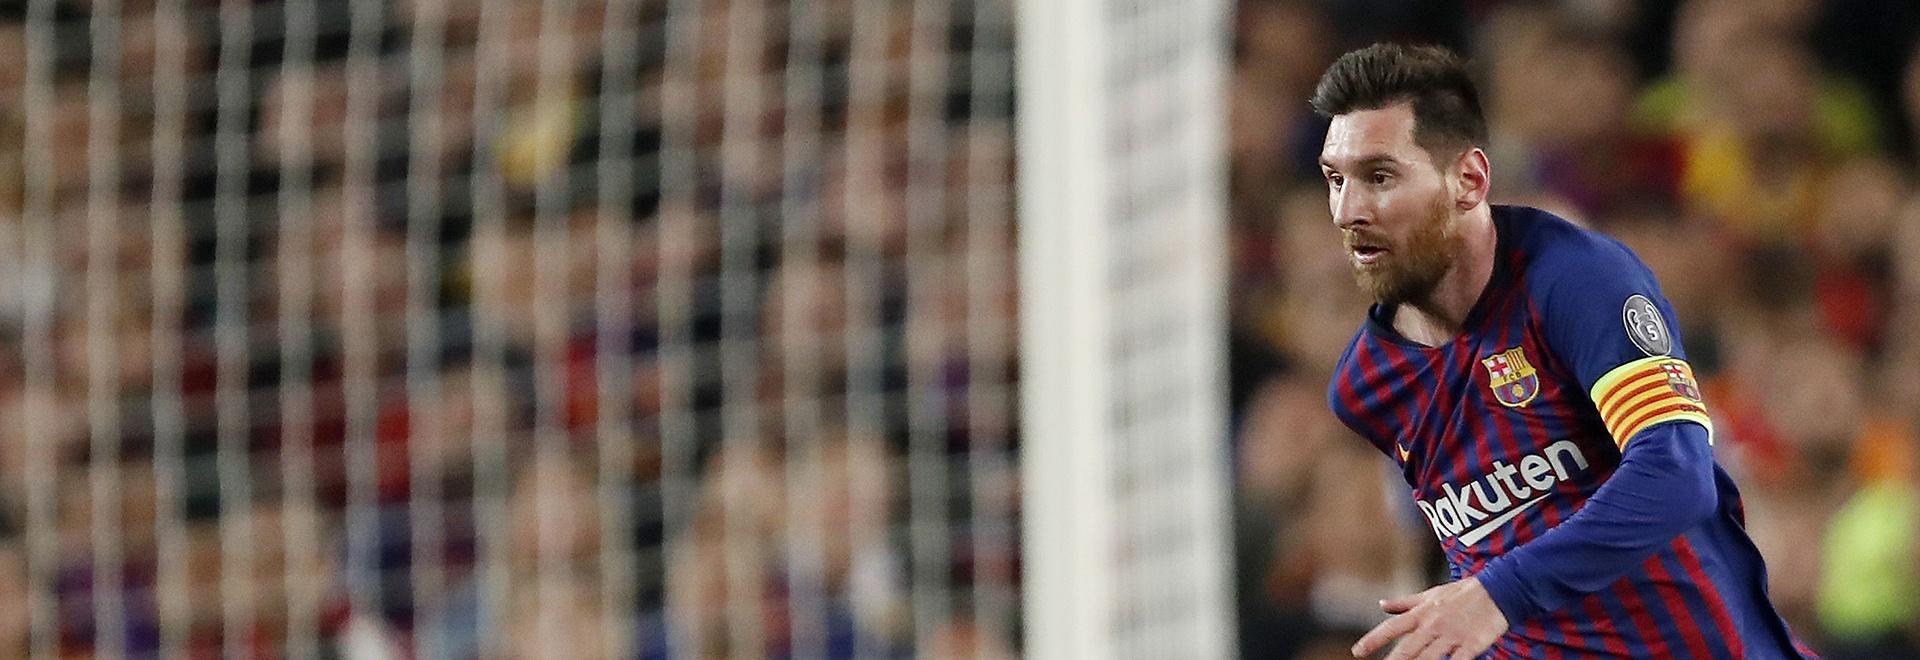 Champions League: Messi tutti i gol